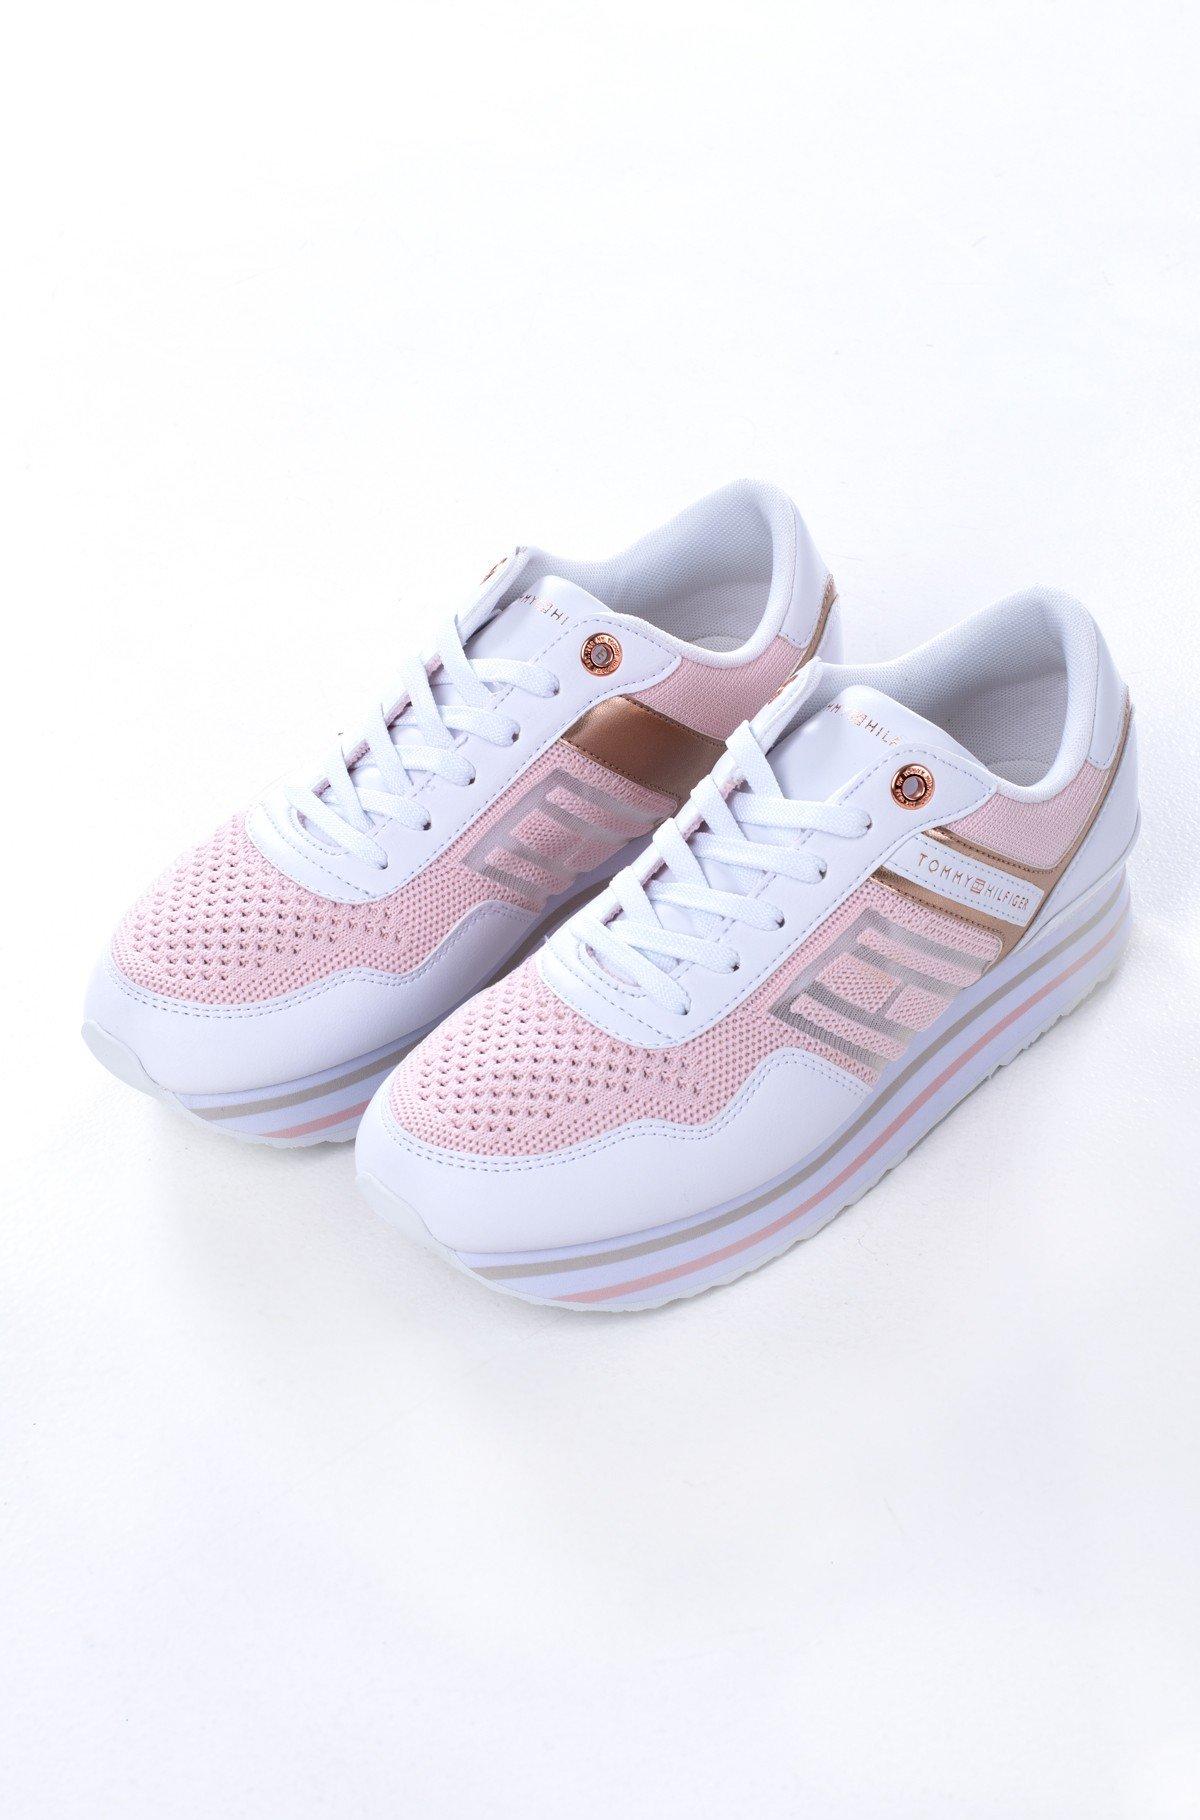 Platform sneakers  KNITTED FLATFORM SNEAKER-full-1